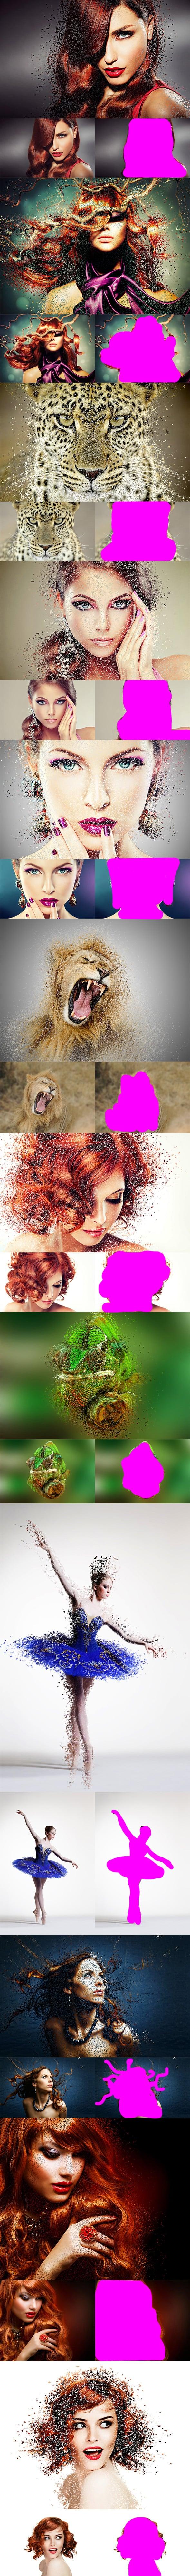 63 VSCO Photoshop Actions: Artistic Actions Bundle - just $9 - 12